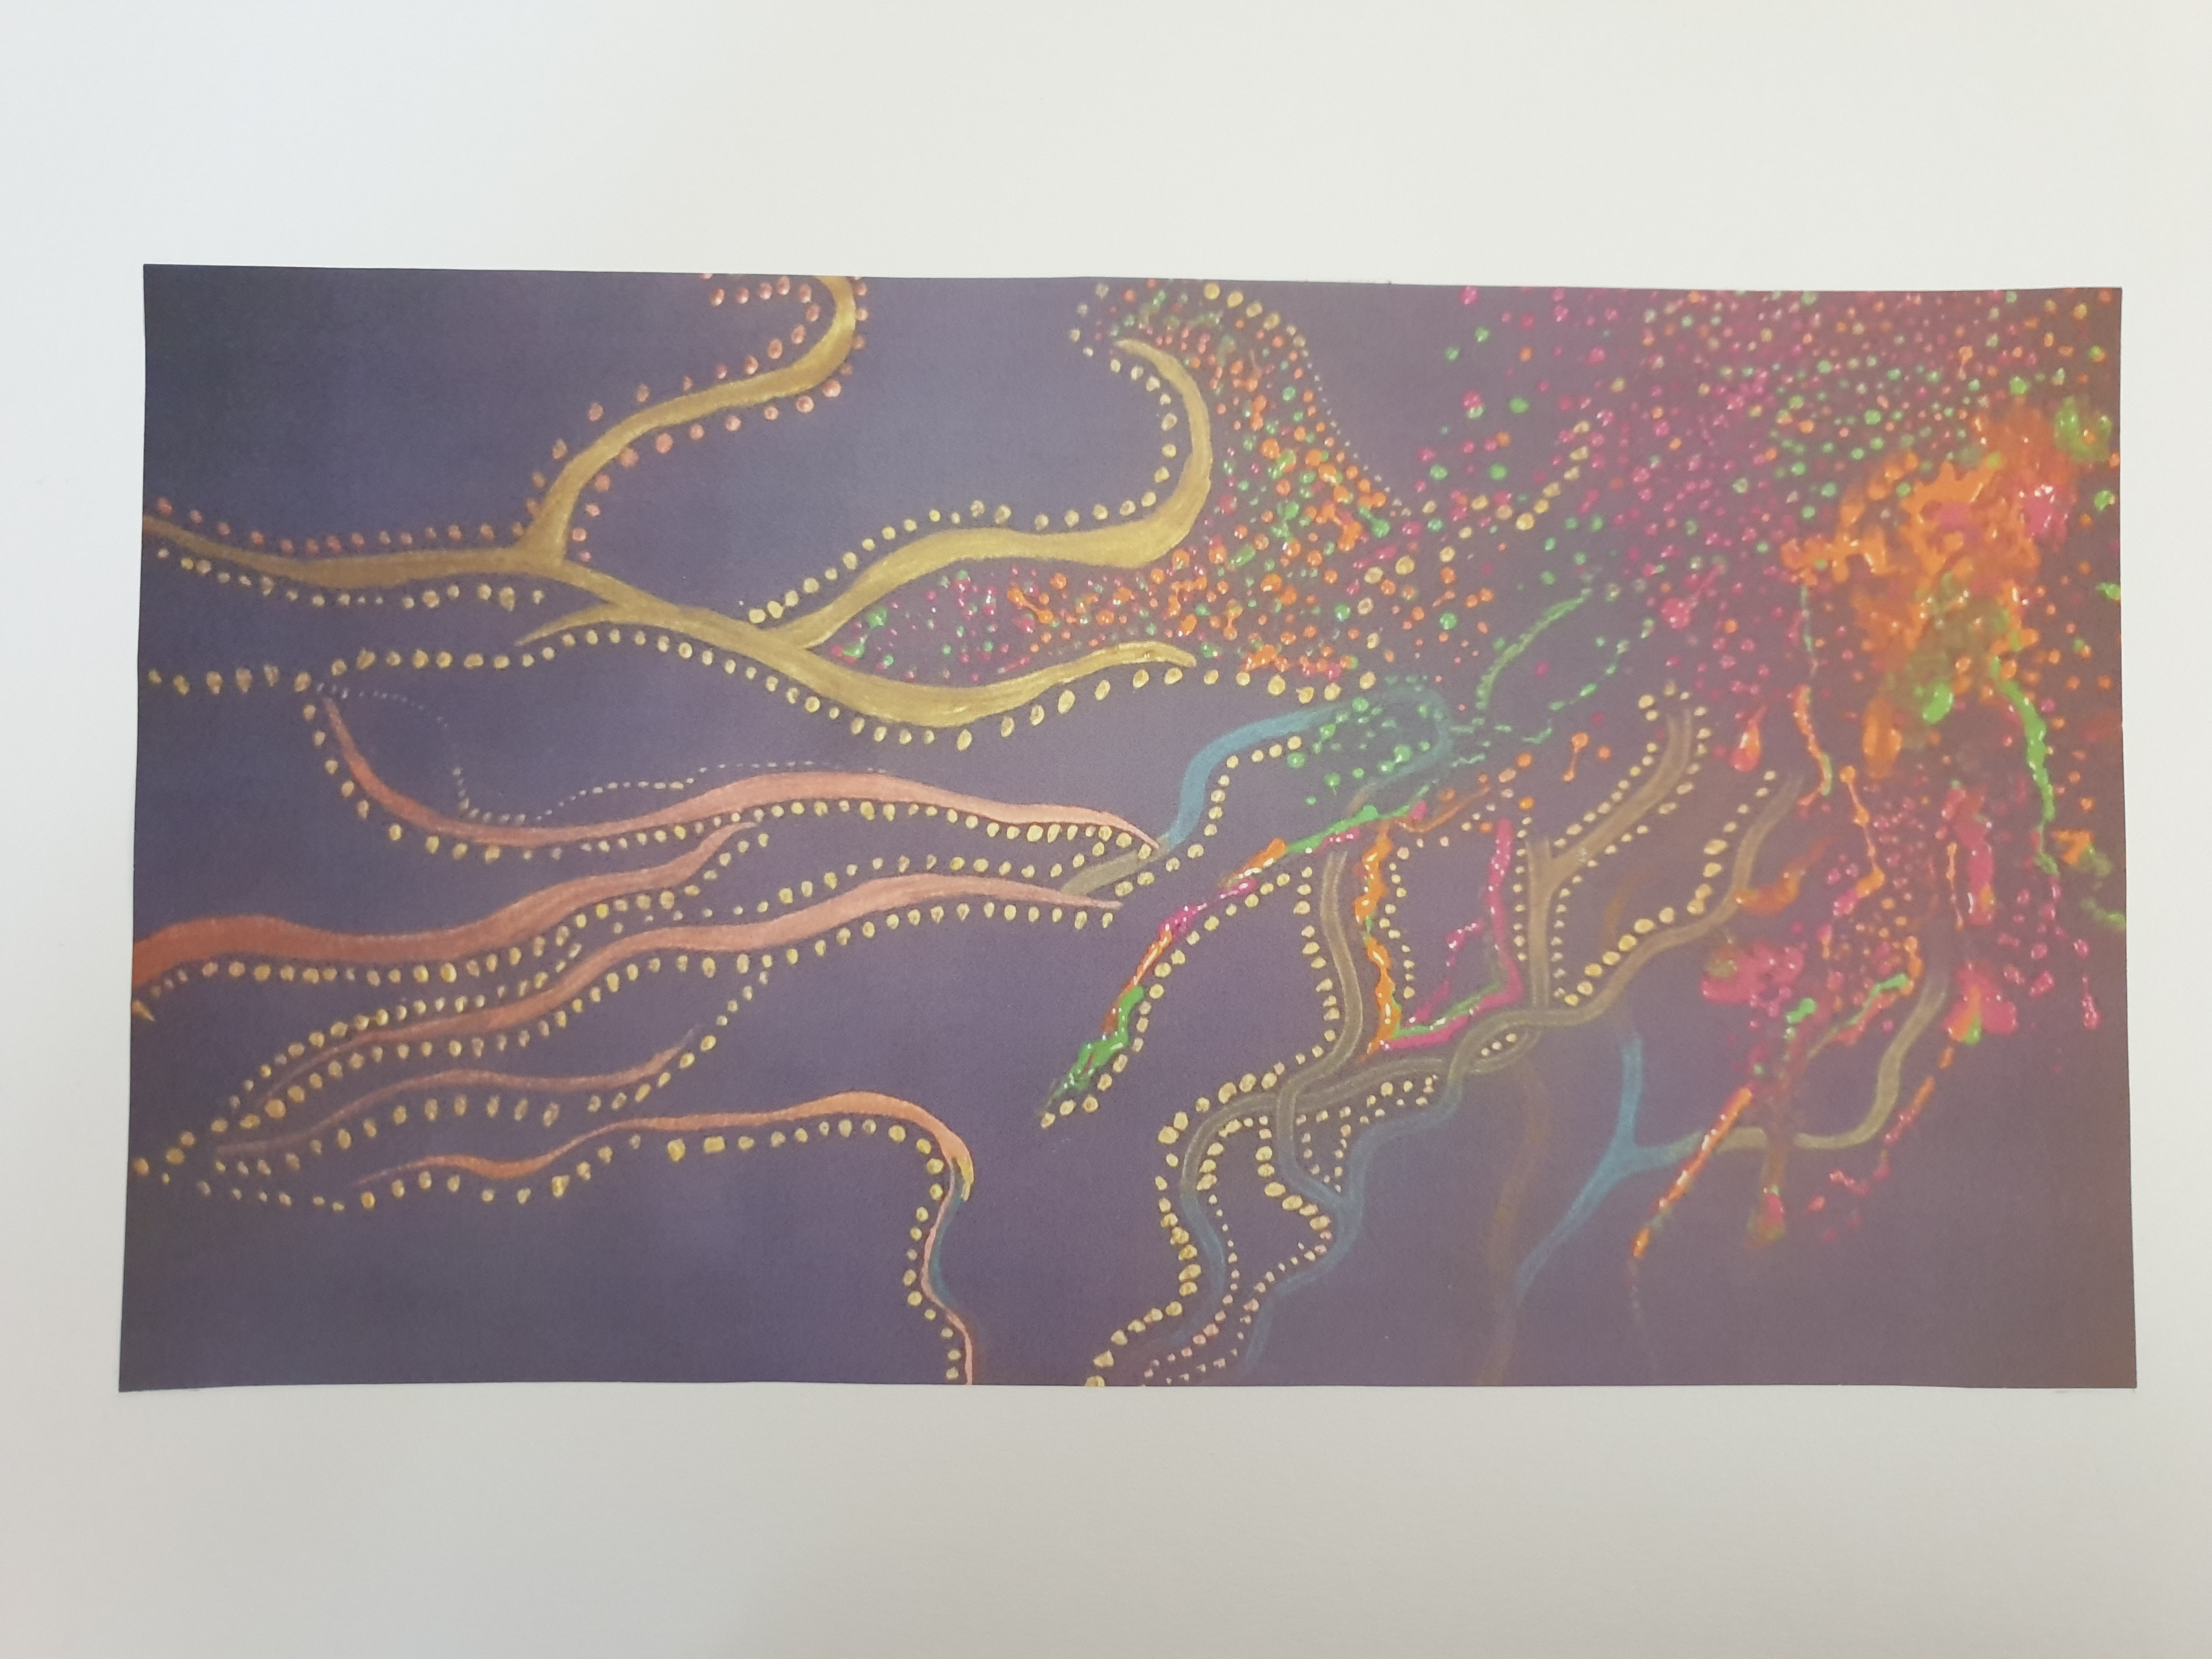 Creative Explosion (2015) - Acrylic and Pencil on Card